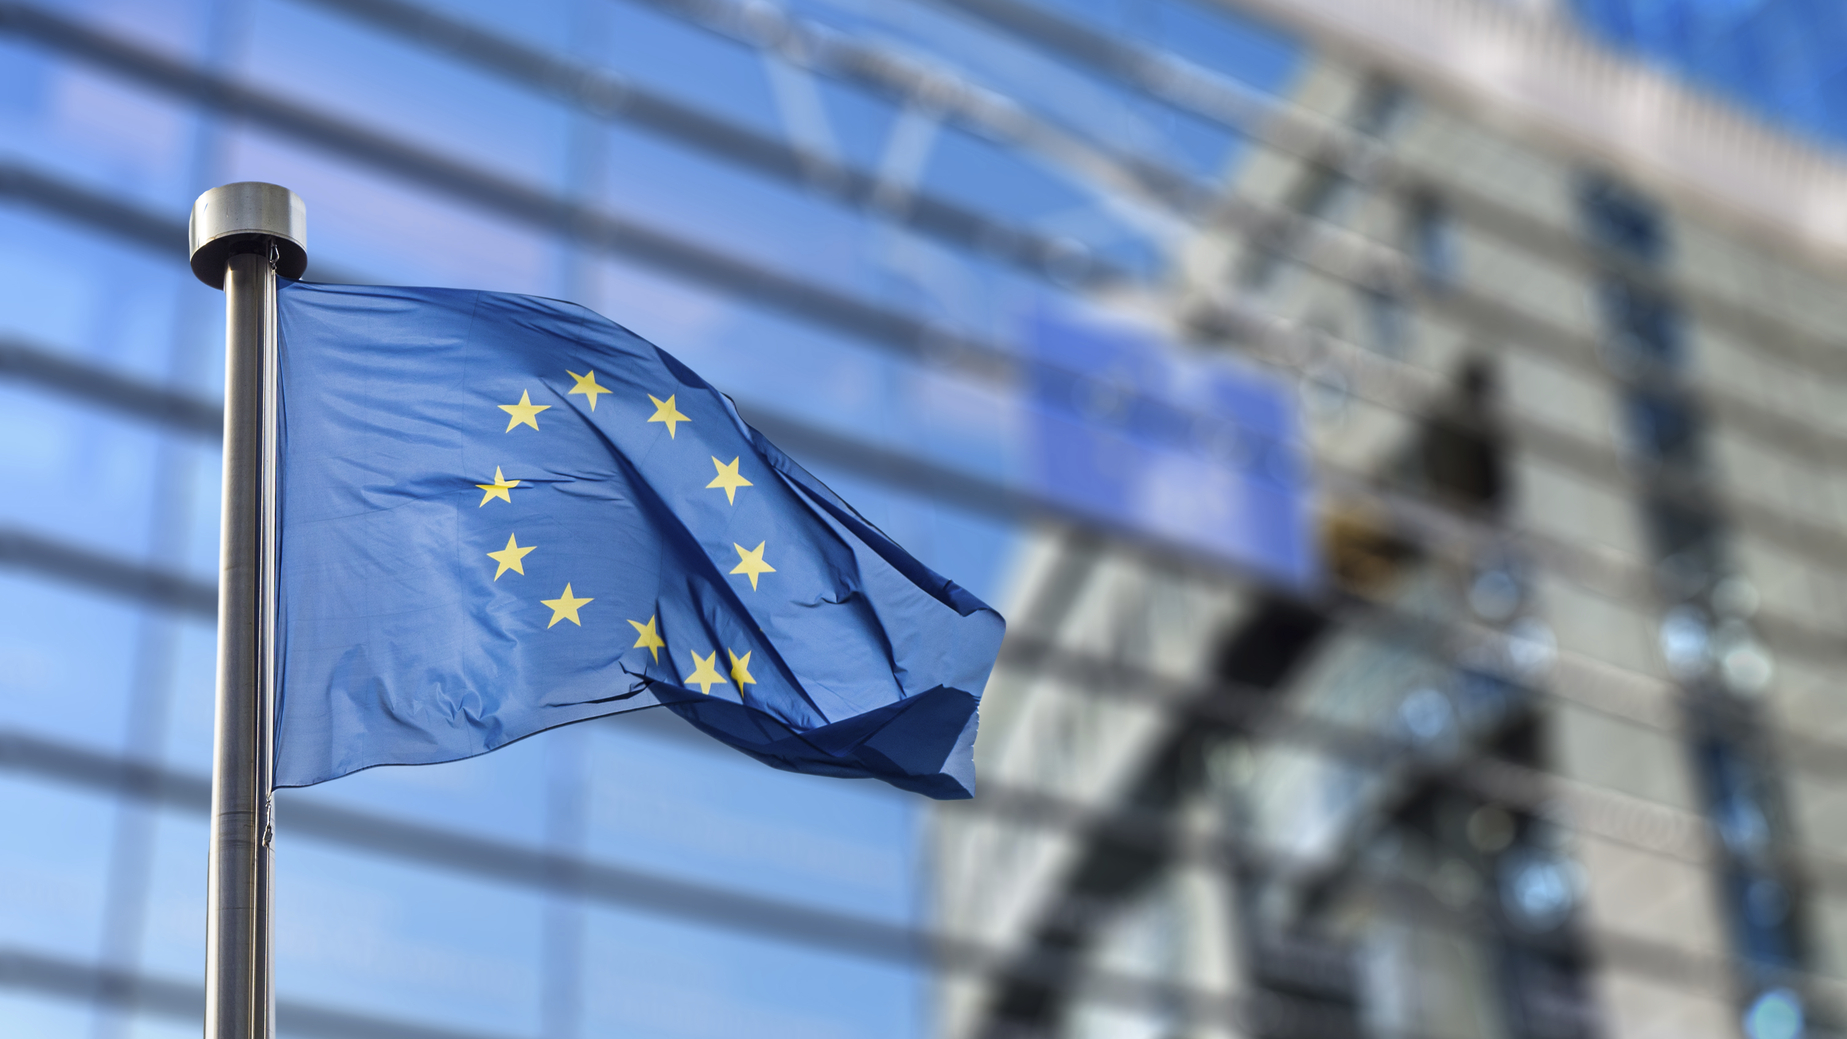 CONSTRUIR PUENTES CON EUROPA